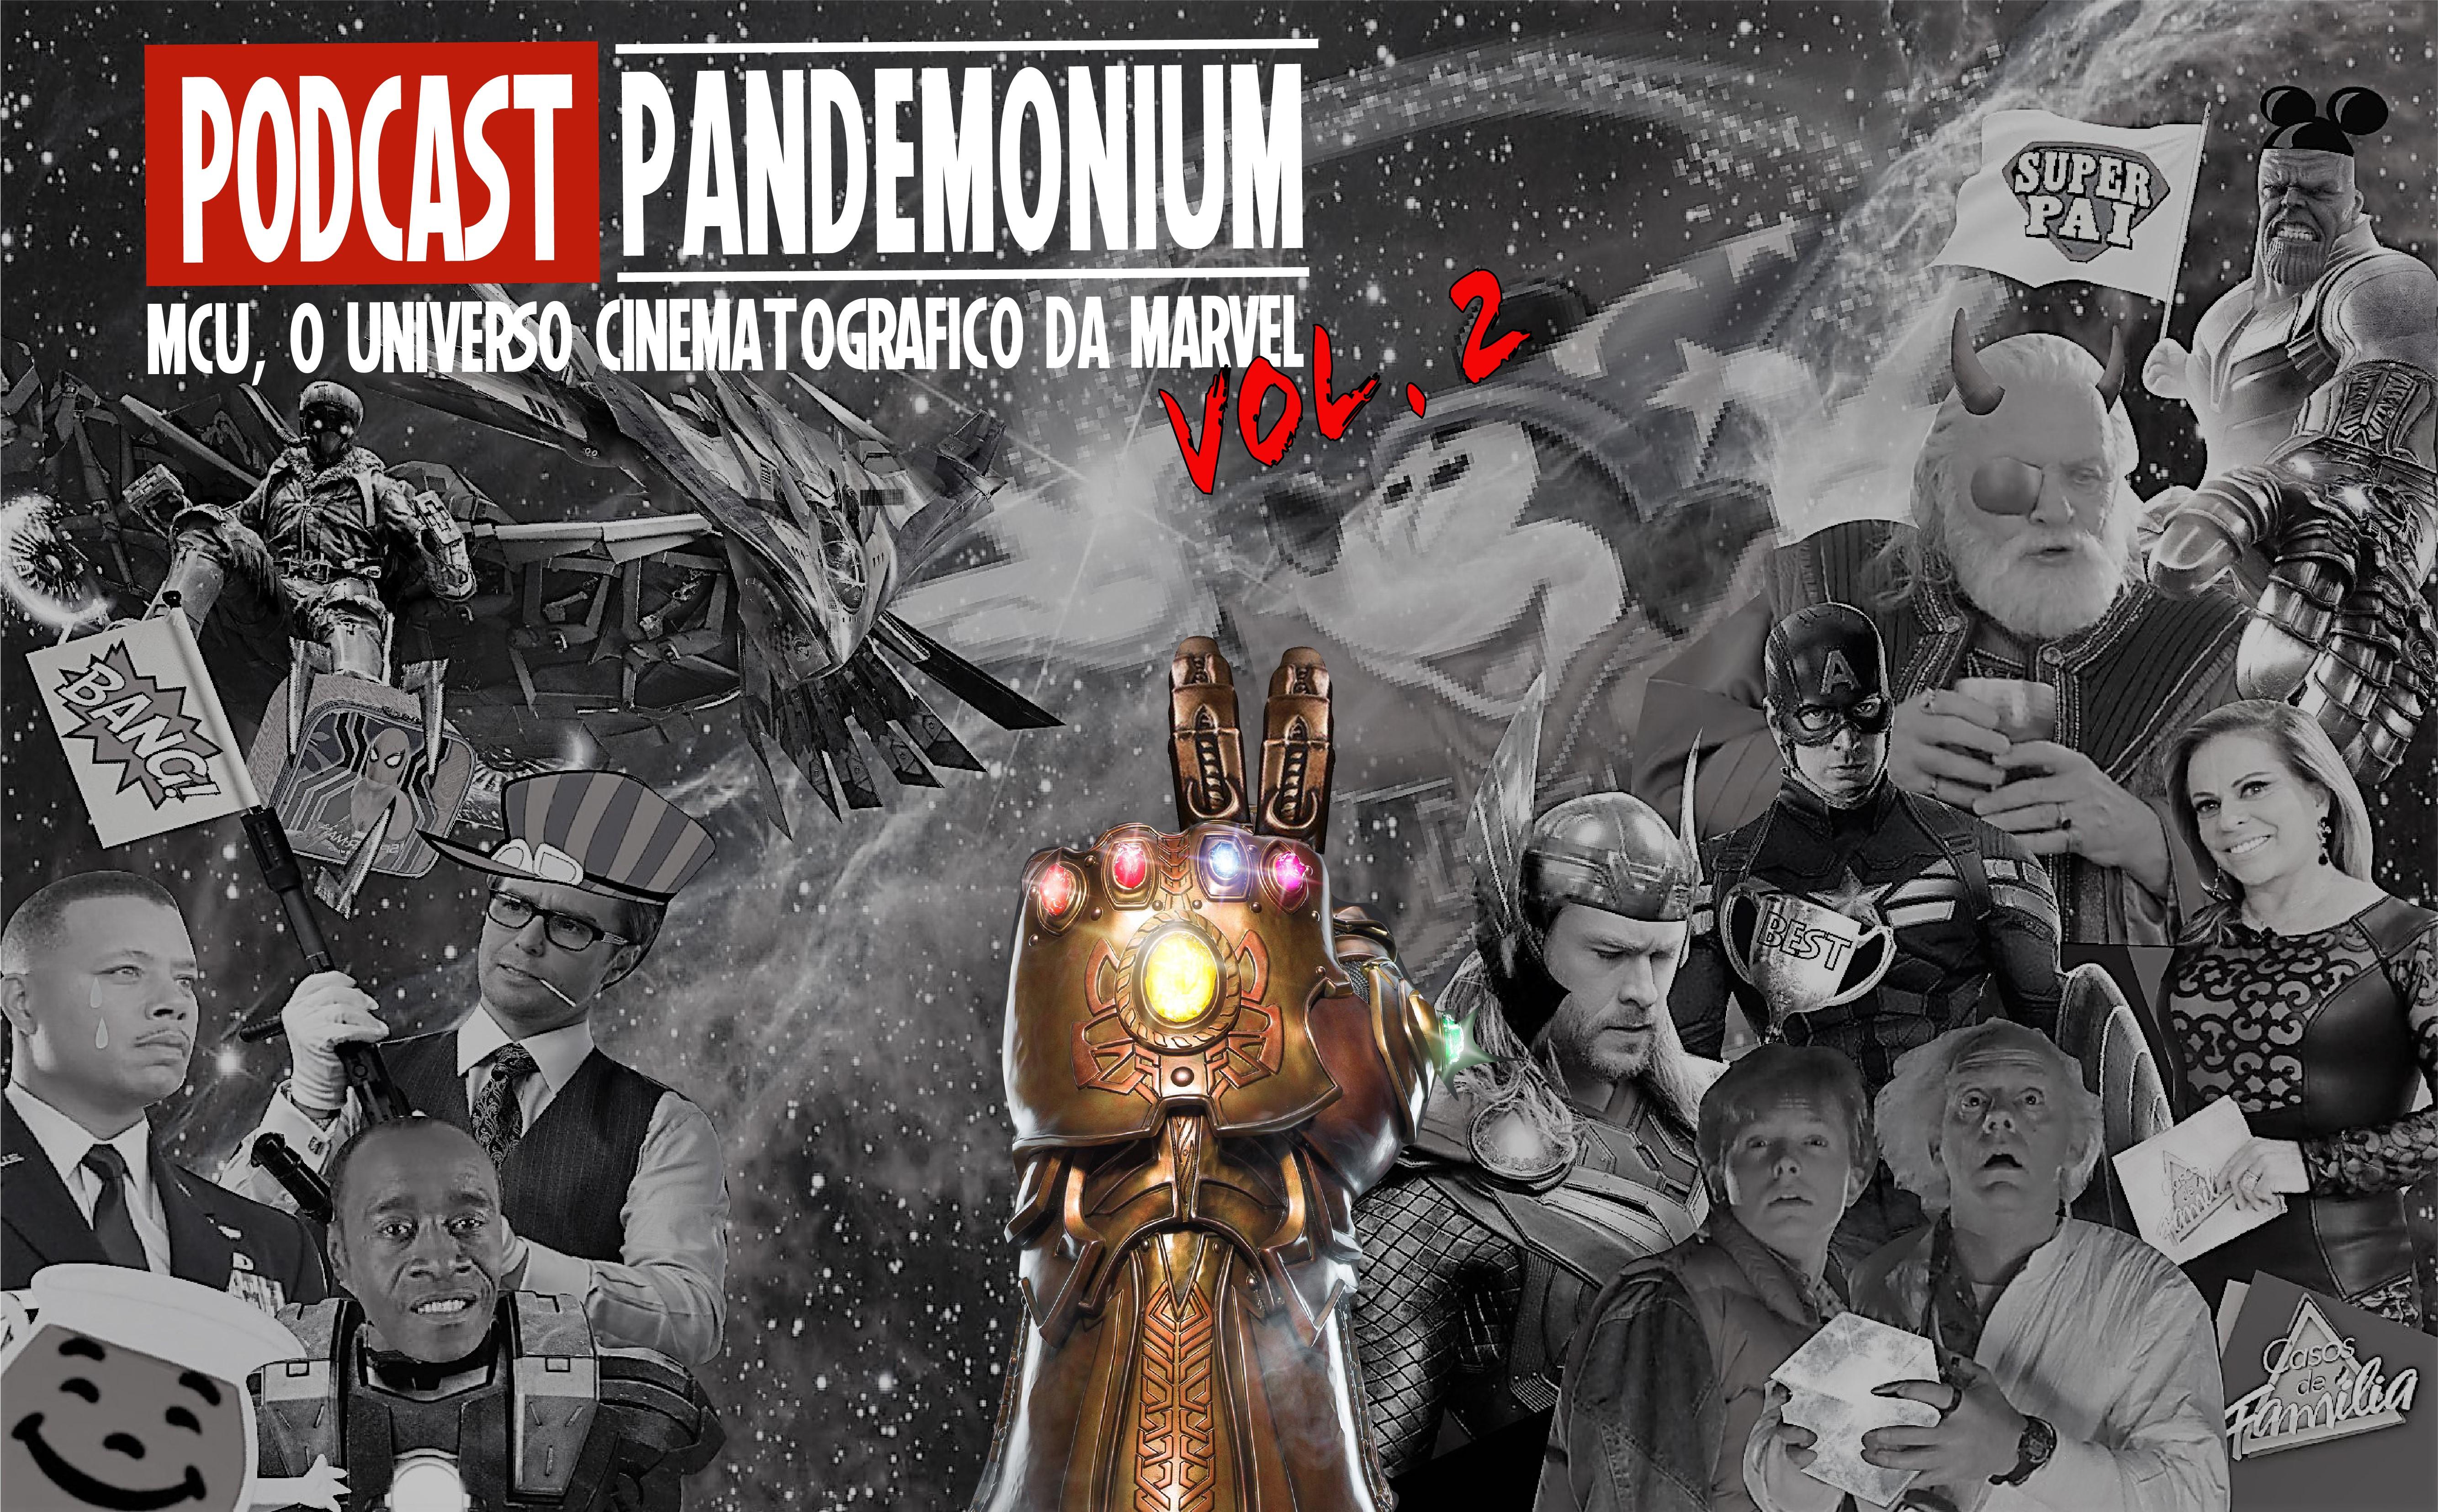 Podcast PandemoniuM 12 MCU, O Universo Cinematografico da Marvel vol.2